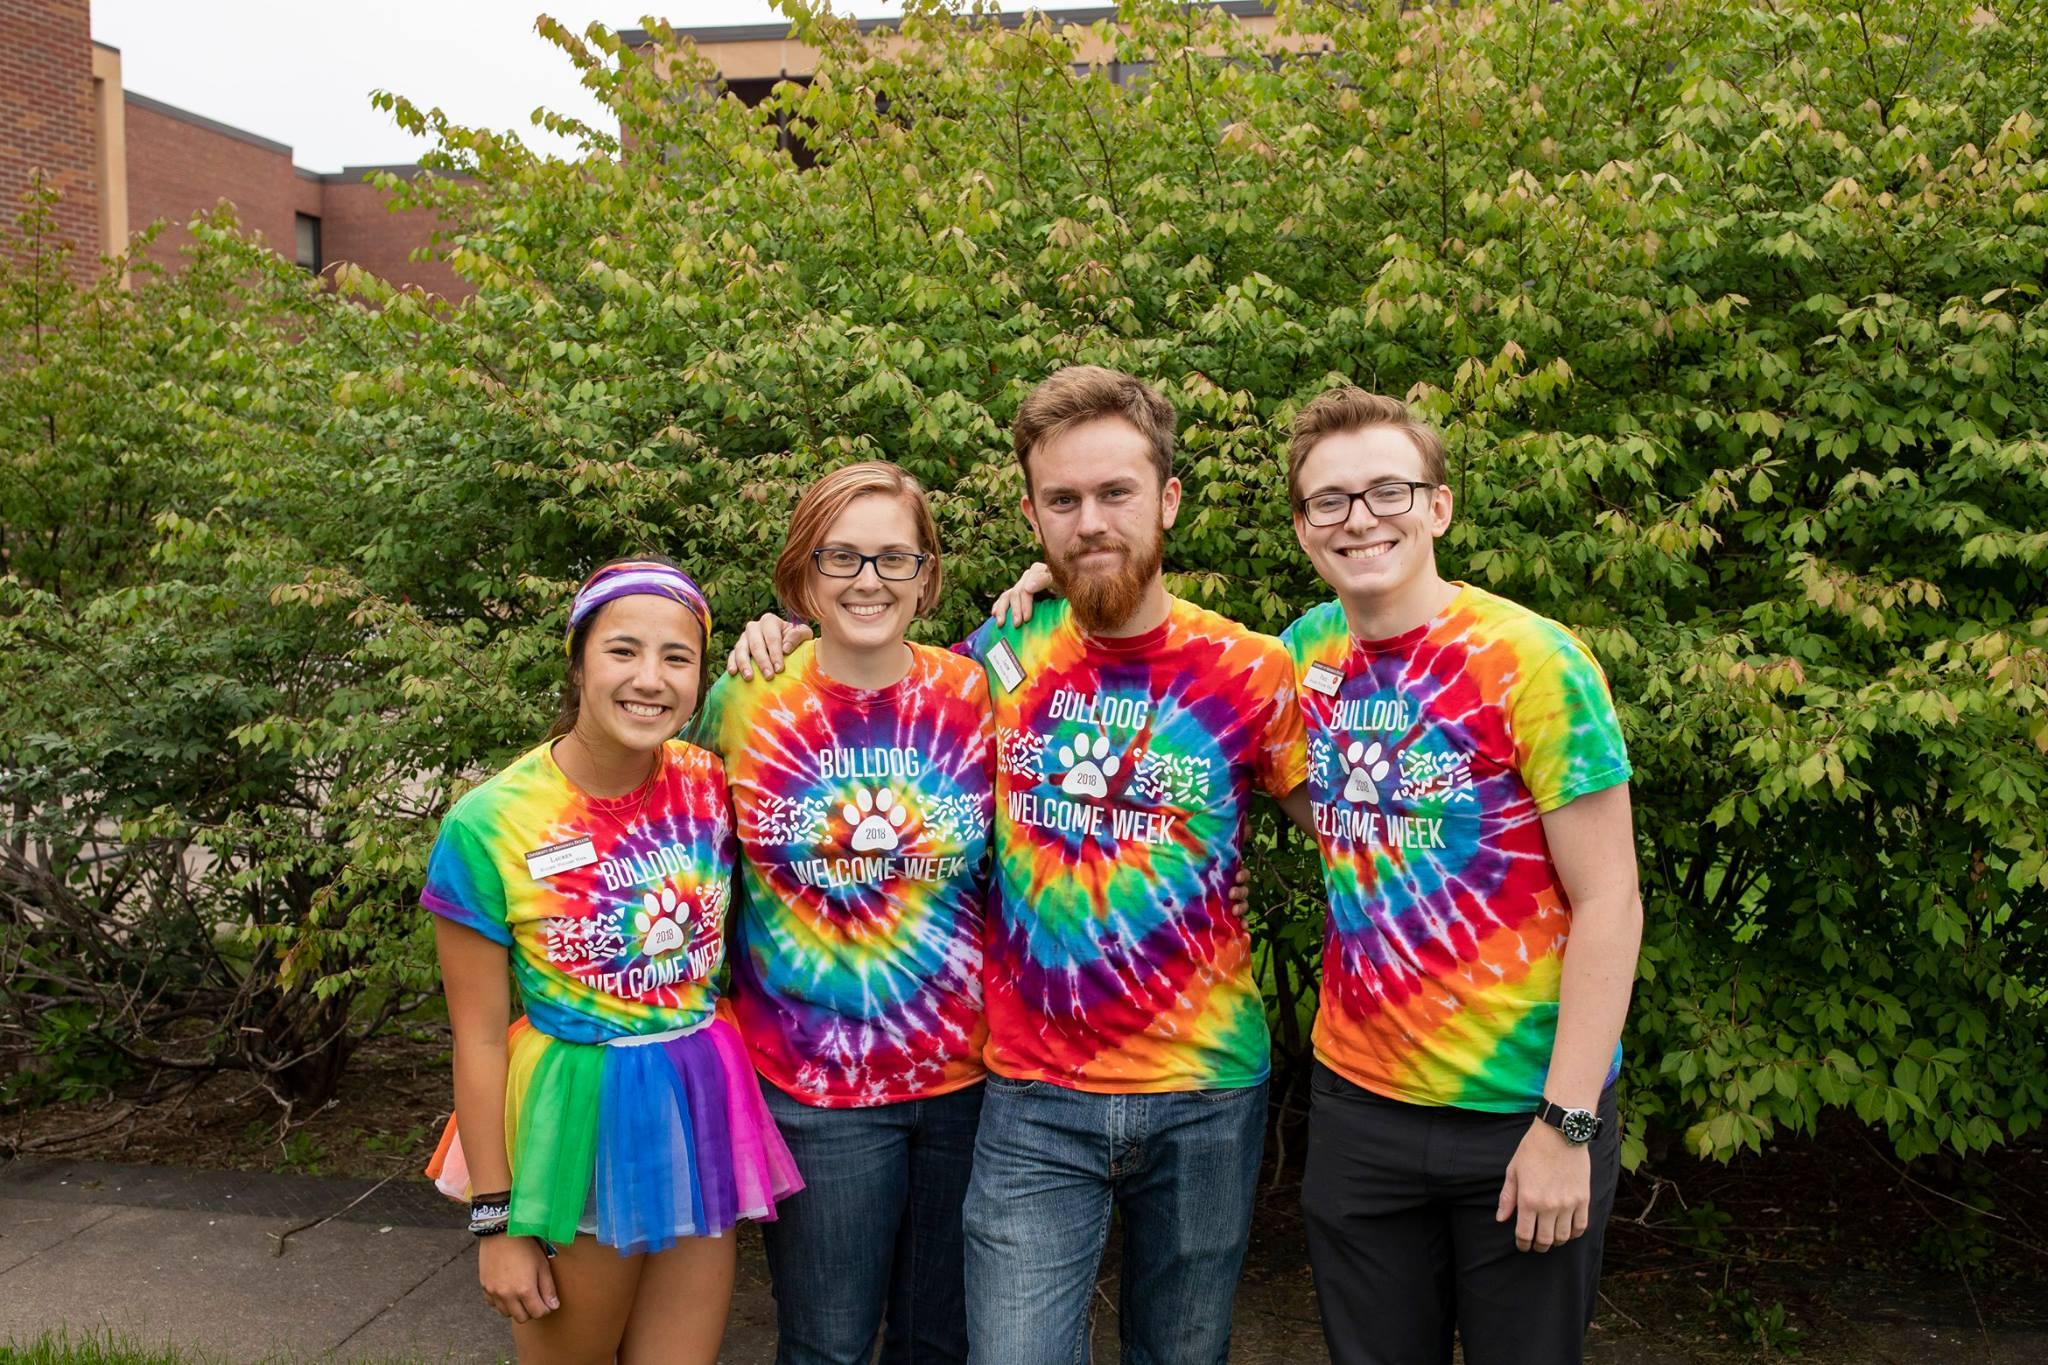 Left to right. Lauren Kotz, Emily Borra, Jacob G. Larsen, and Paul Cerar at Welcome Week 2018. Photo by Nick Vittorio.